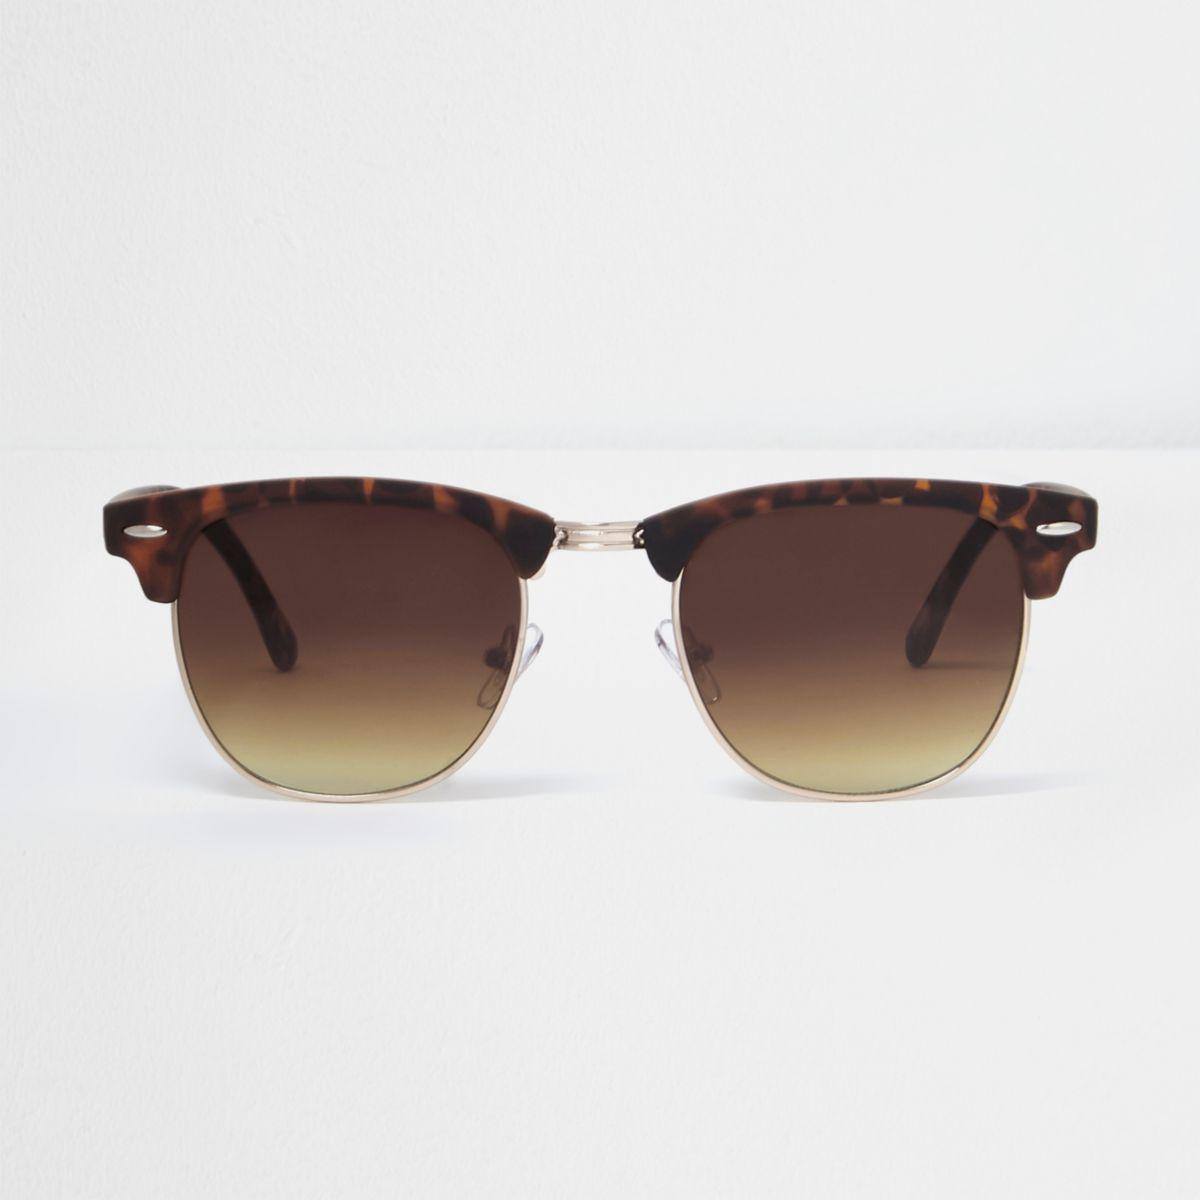 Brown tortoiseshell retro sunglasses